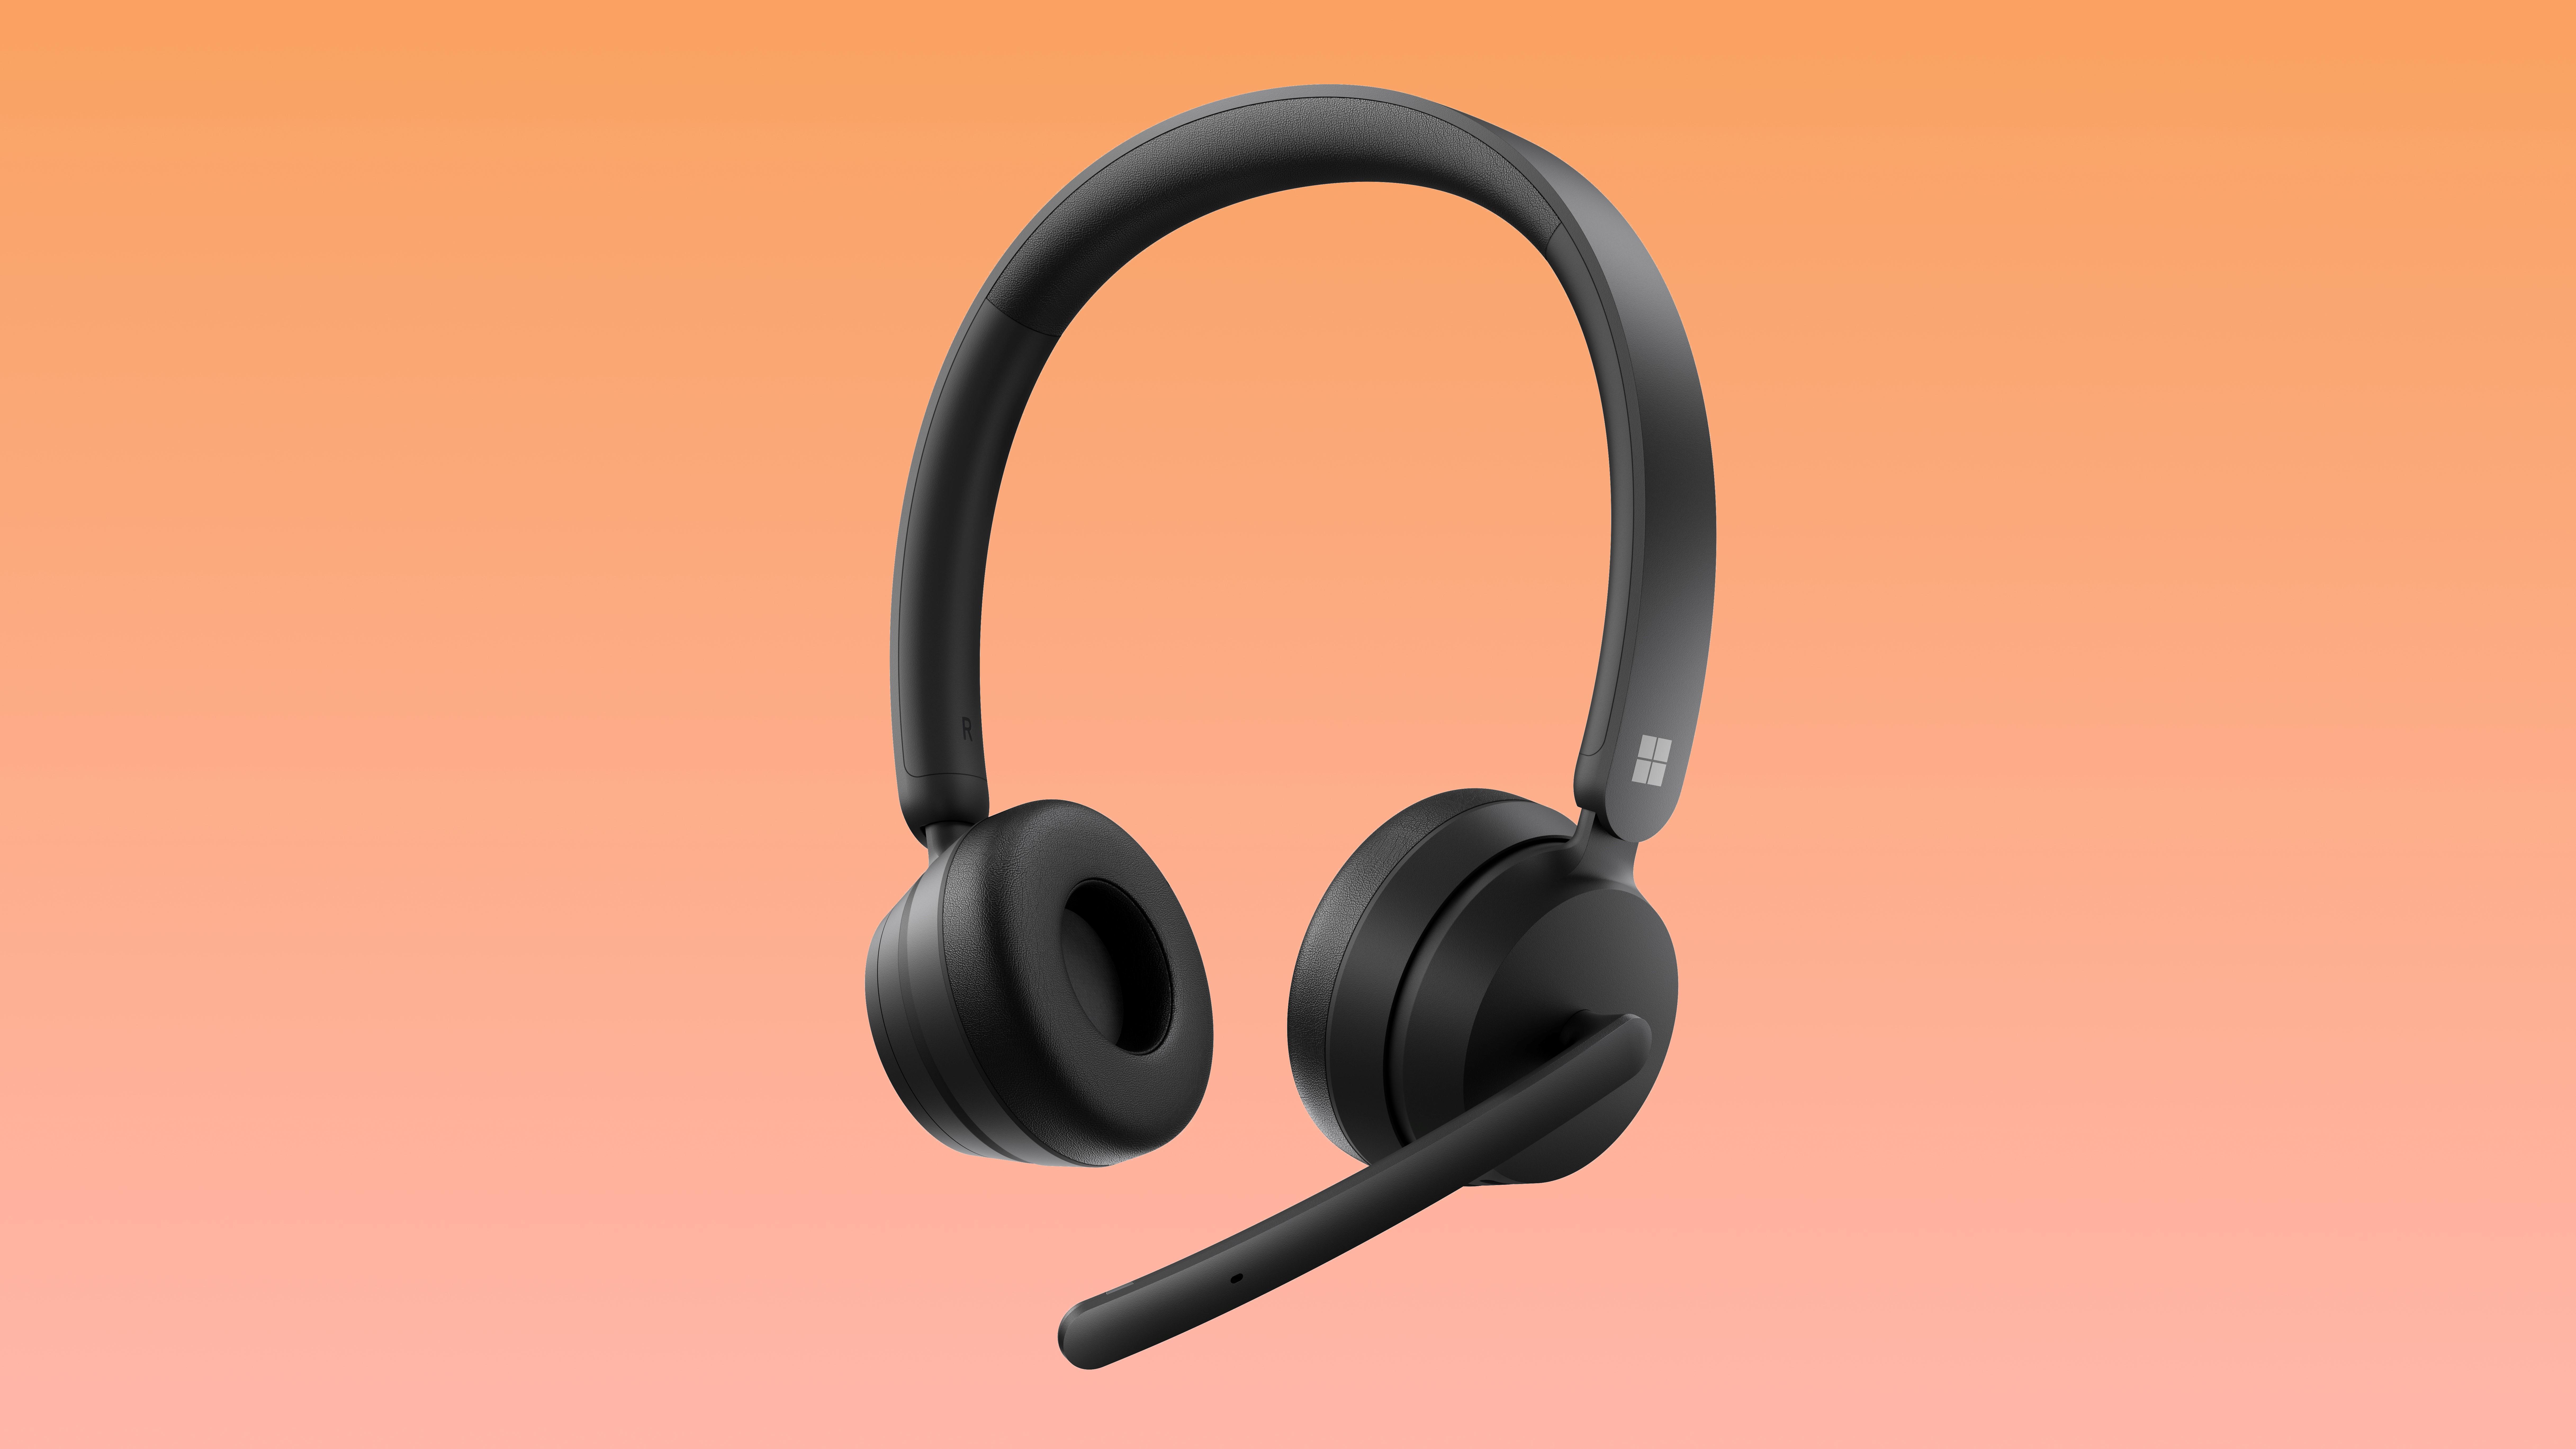 Microsoft Surface Headphones 2+ for Business mogu biti idealne slušalice za rad kod kuće